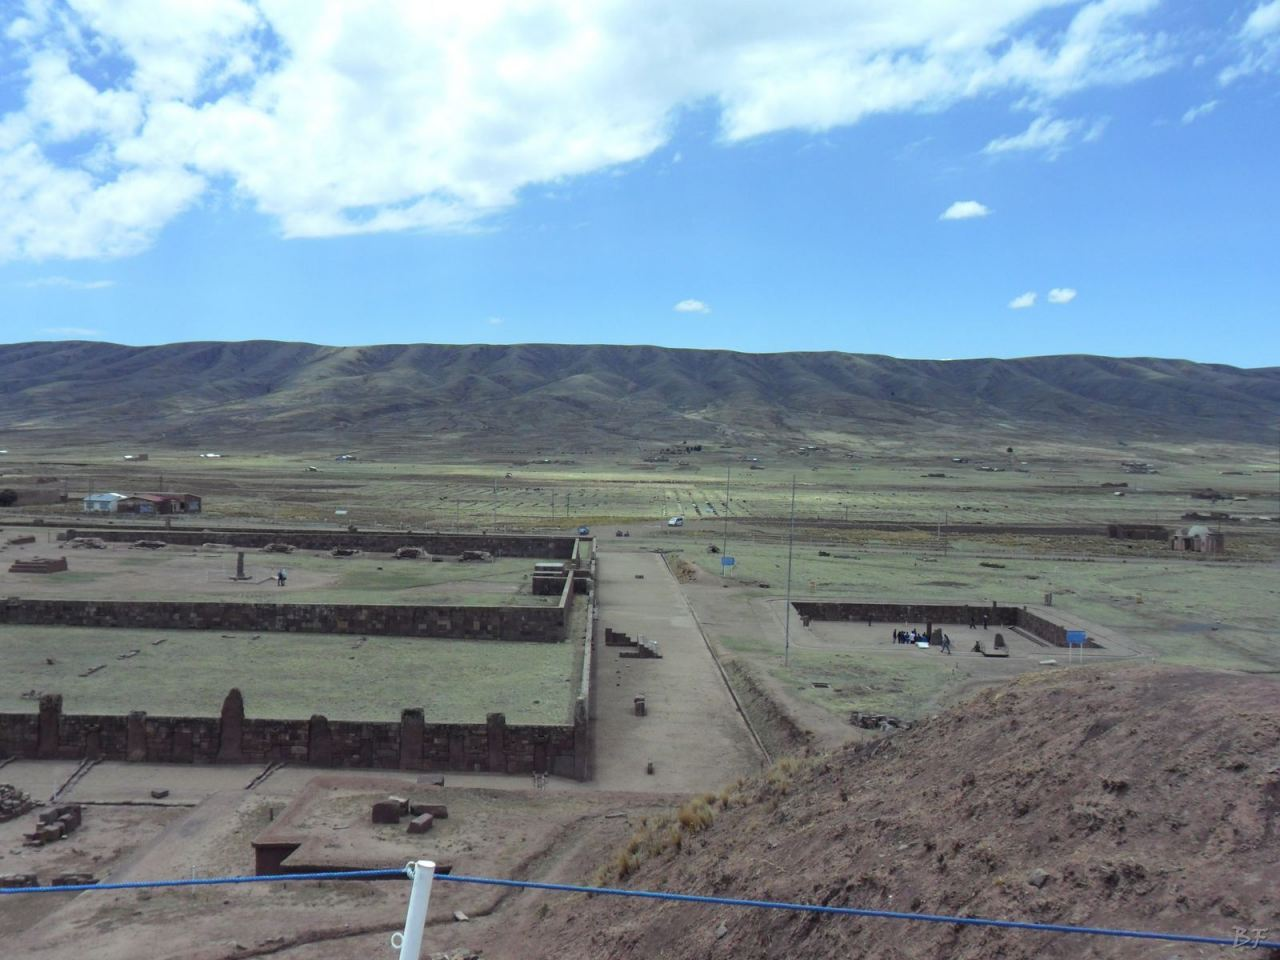 Sito-Megalitico-Piramide-Akapana-Kalasasaya-Menhir-Tiahuanaco-Bolivia-126